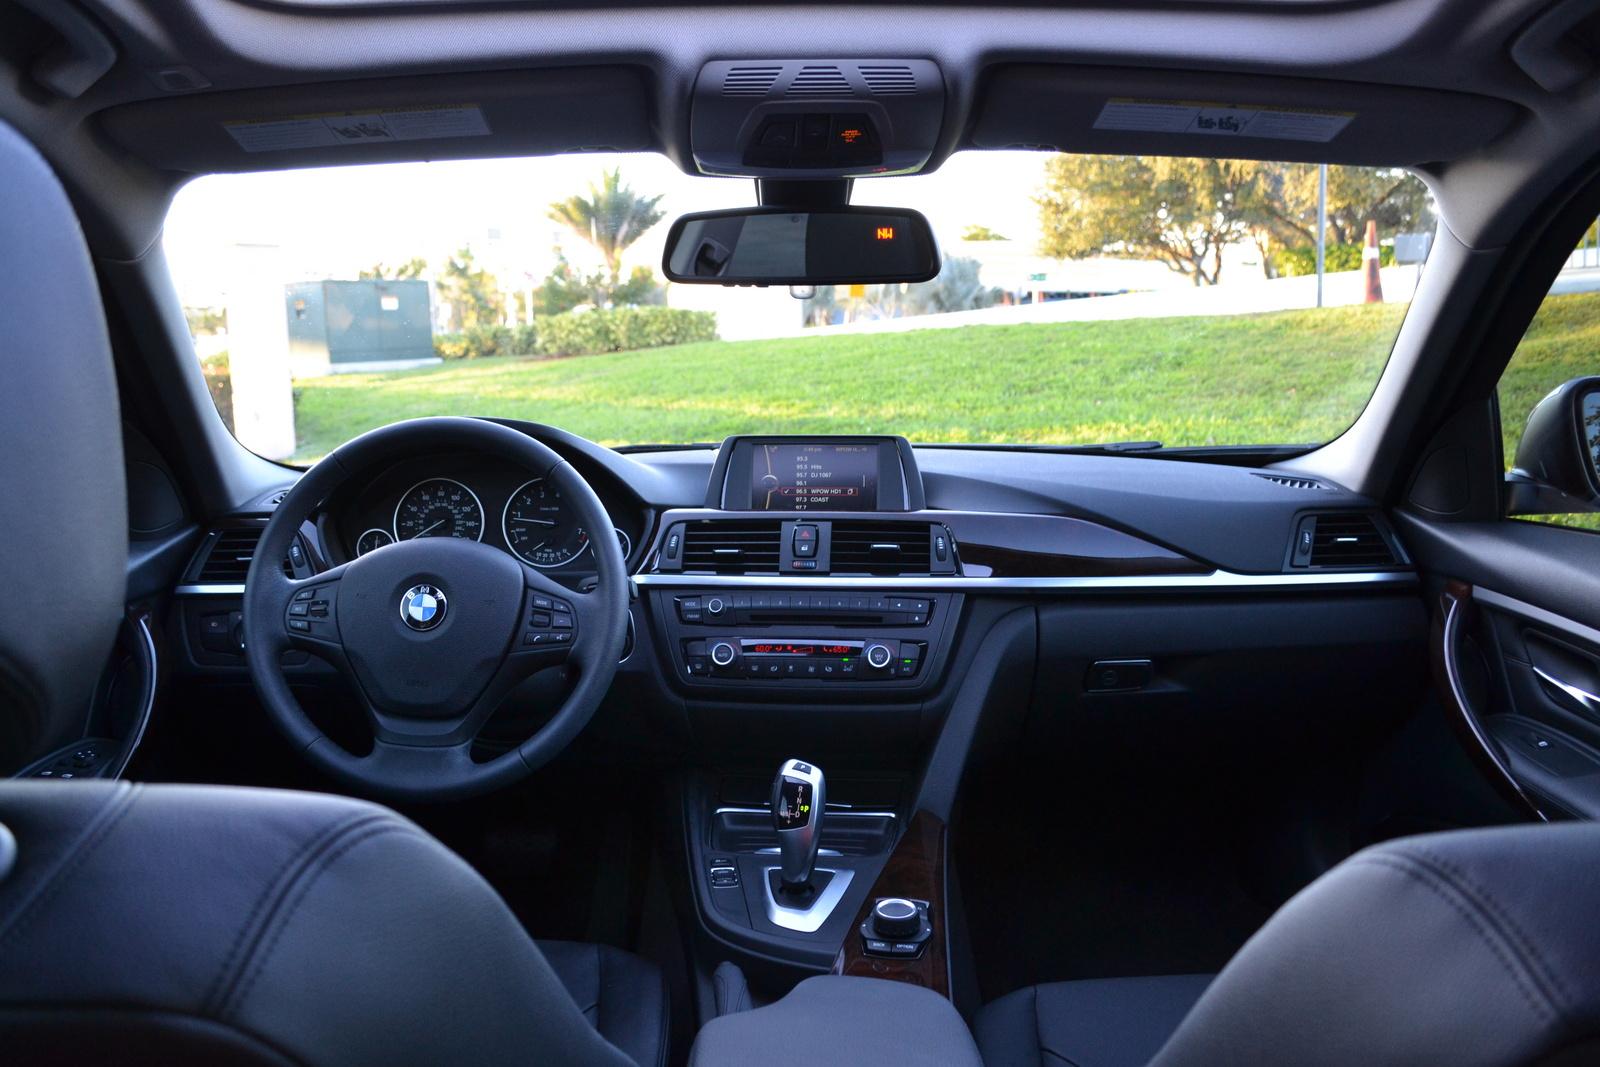 2014 BMW 3 Series Sedan Interior